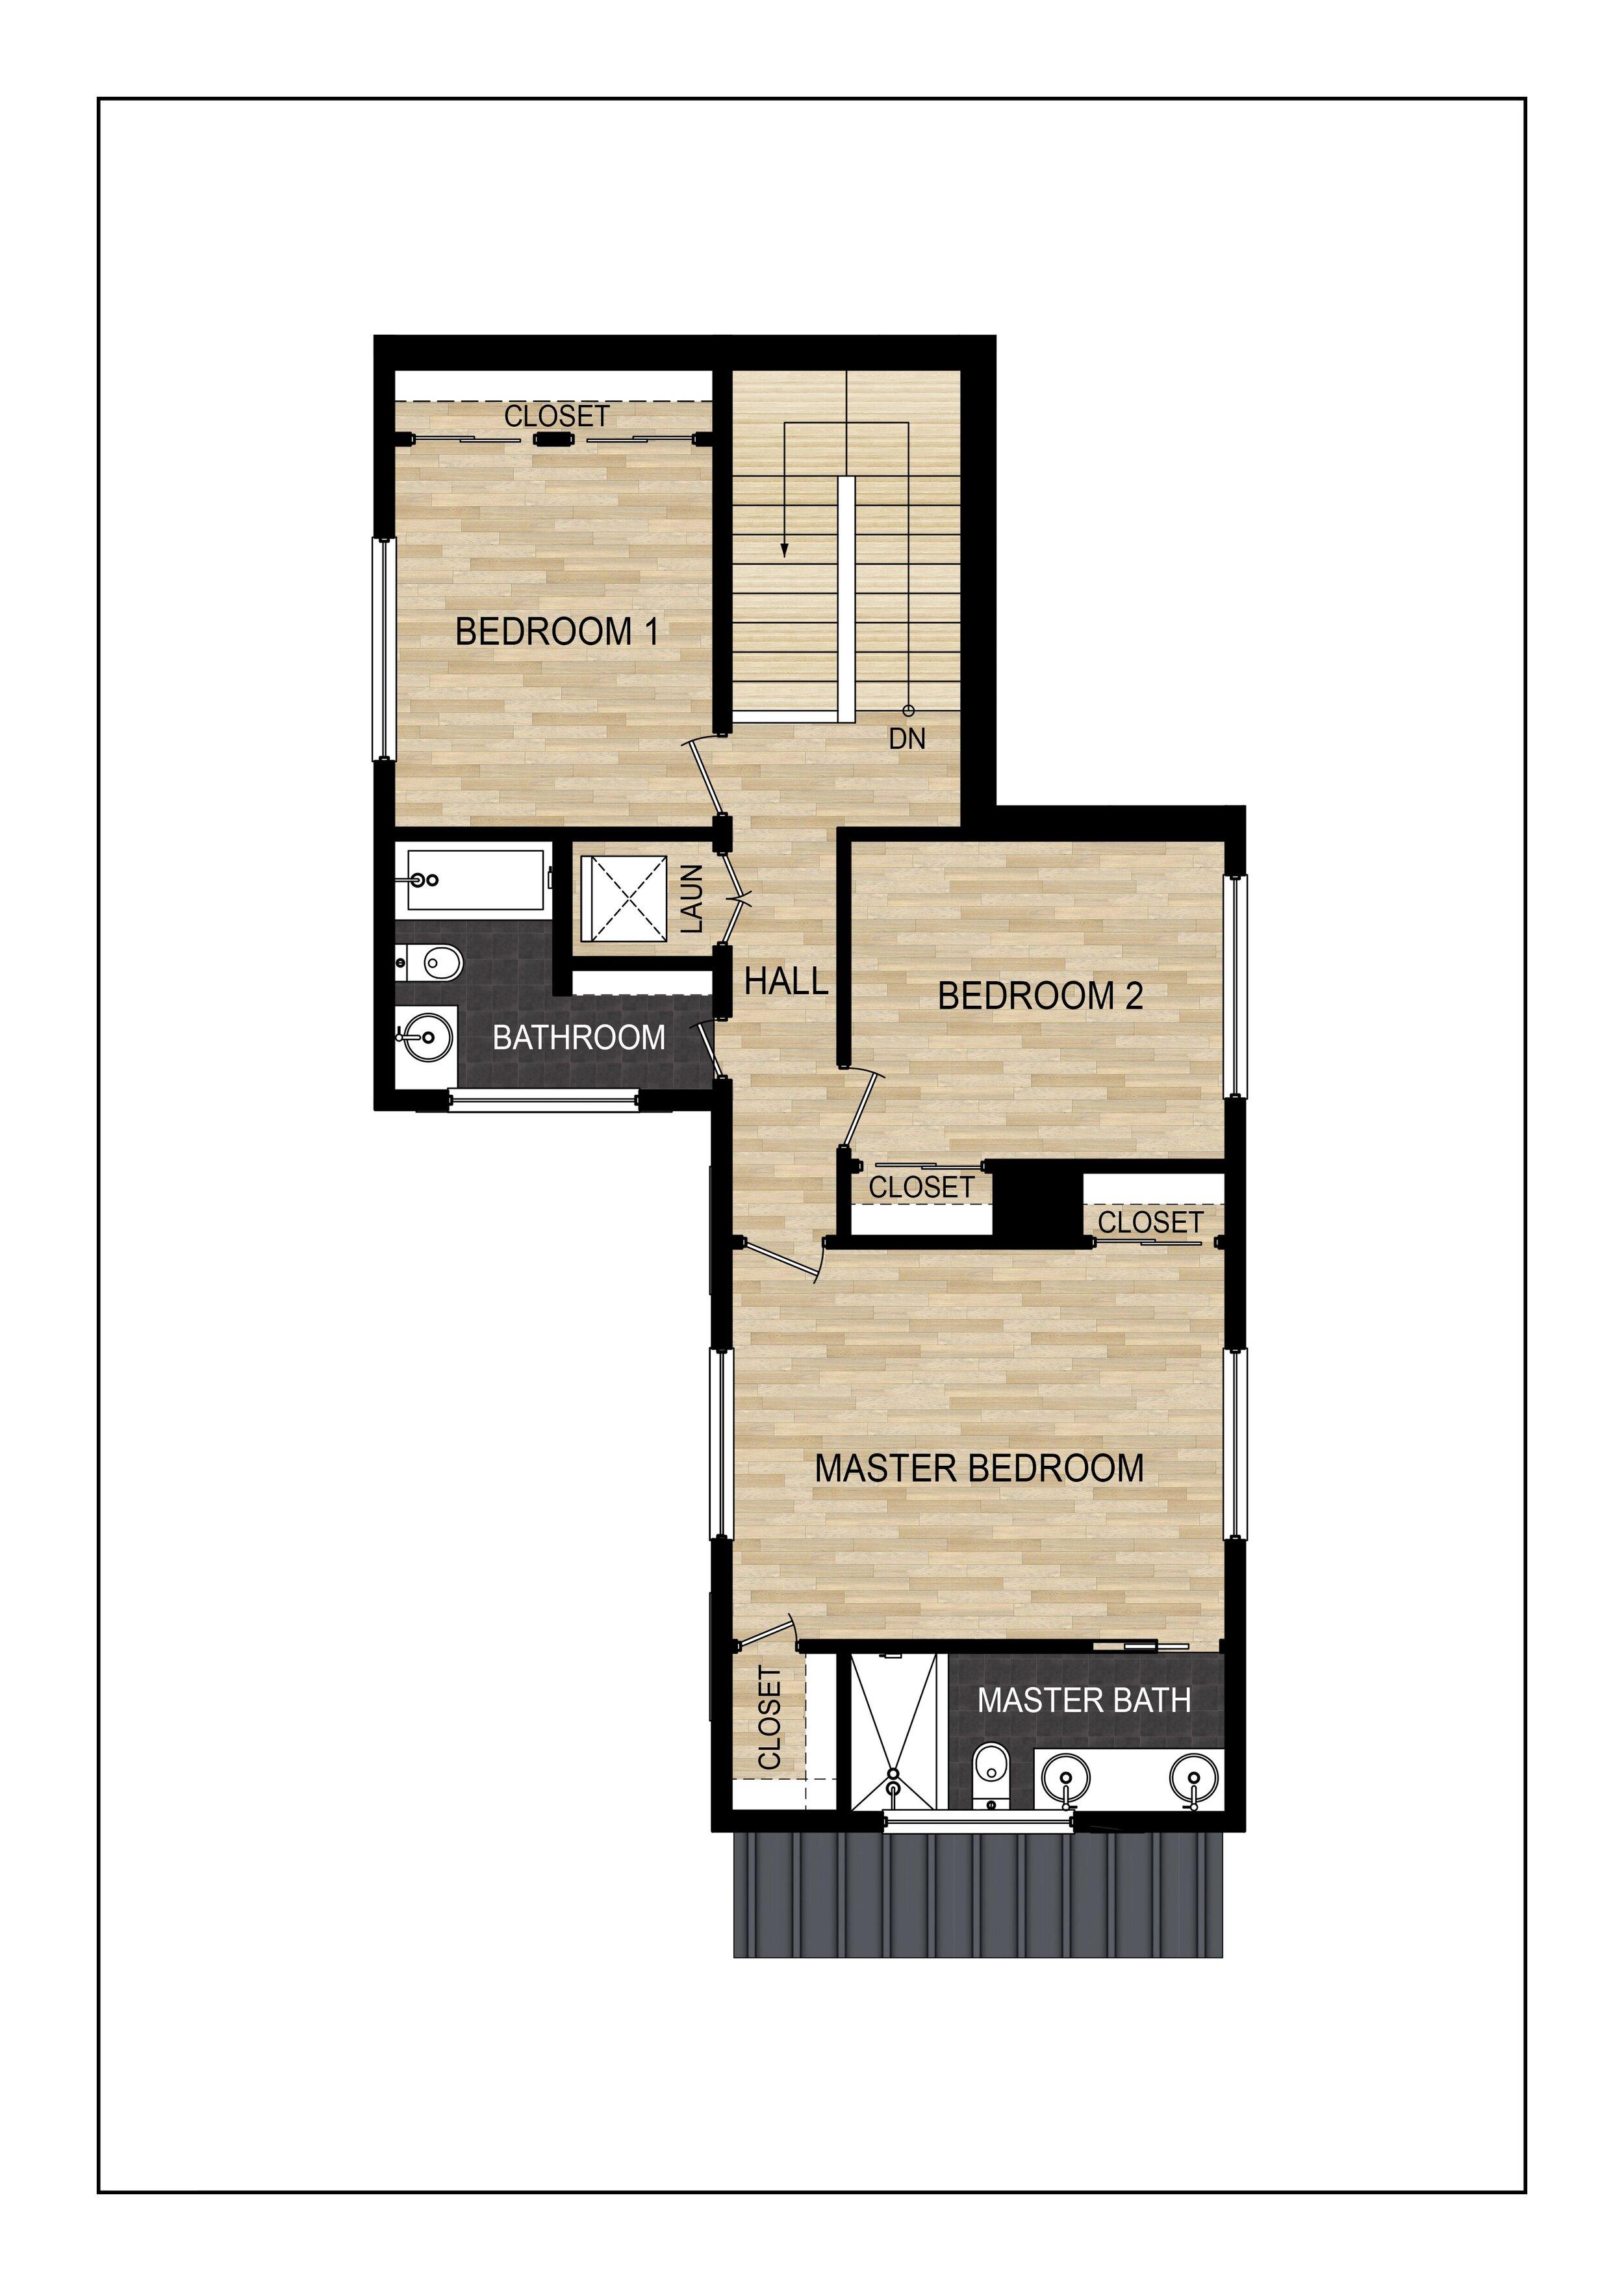 4614-gillis-78745-floorplan-2